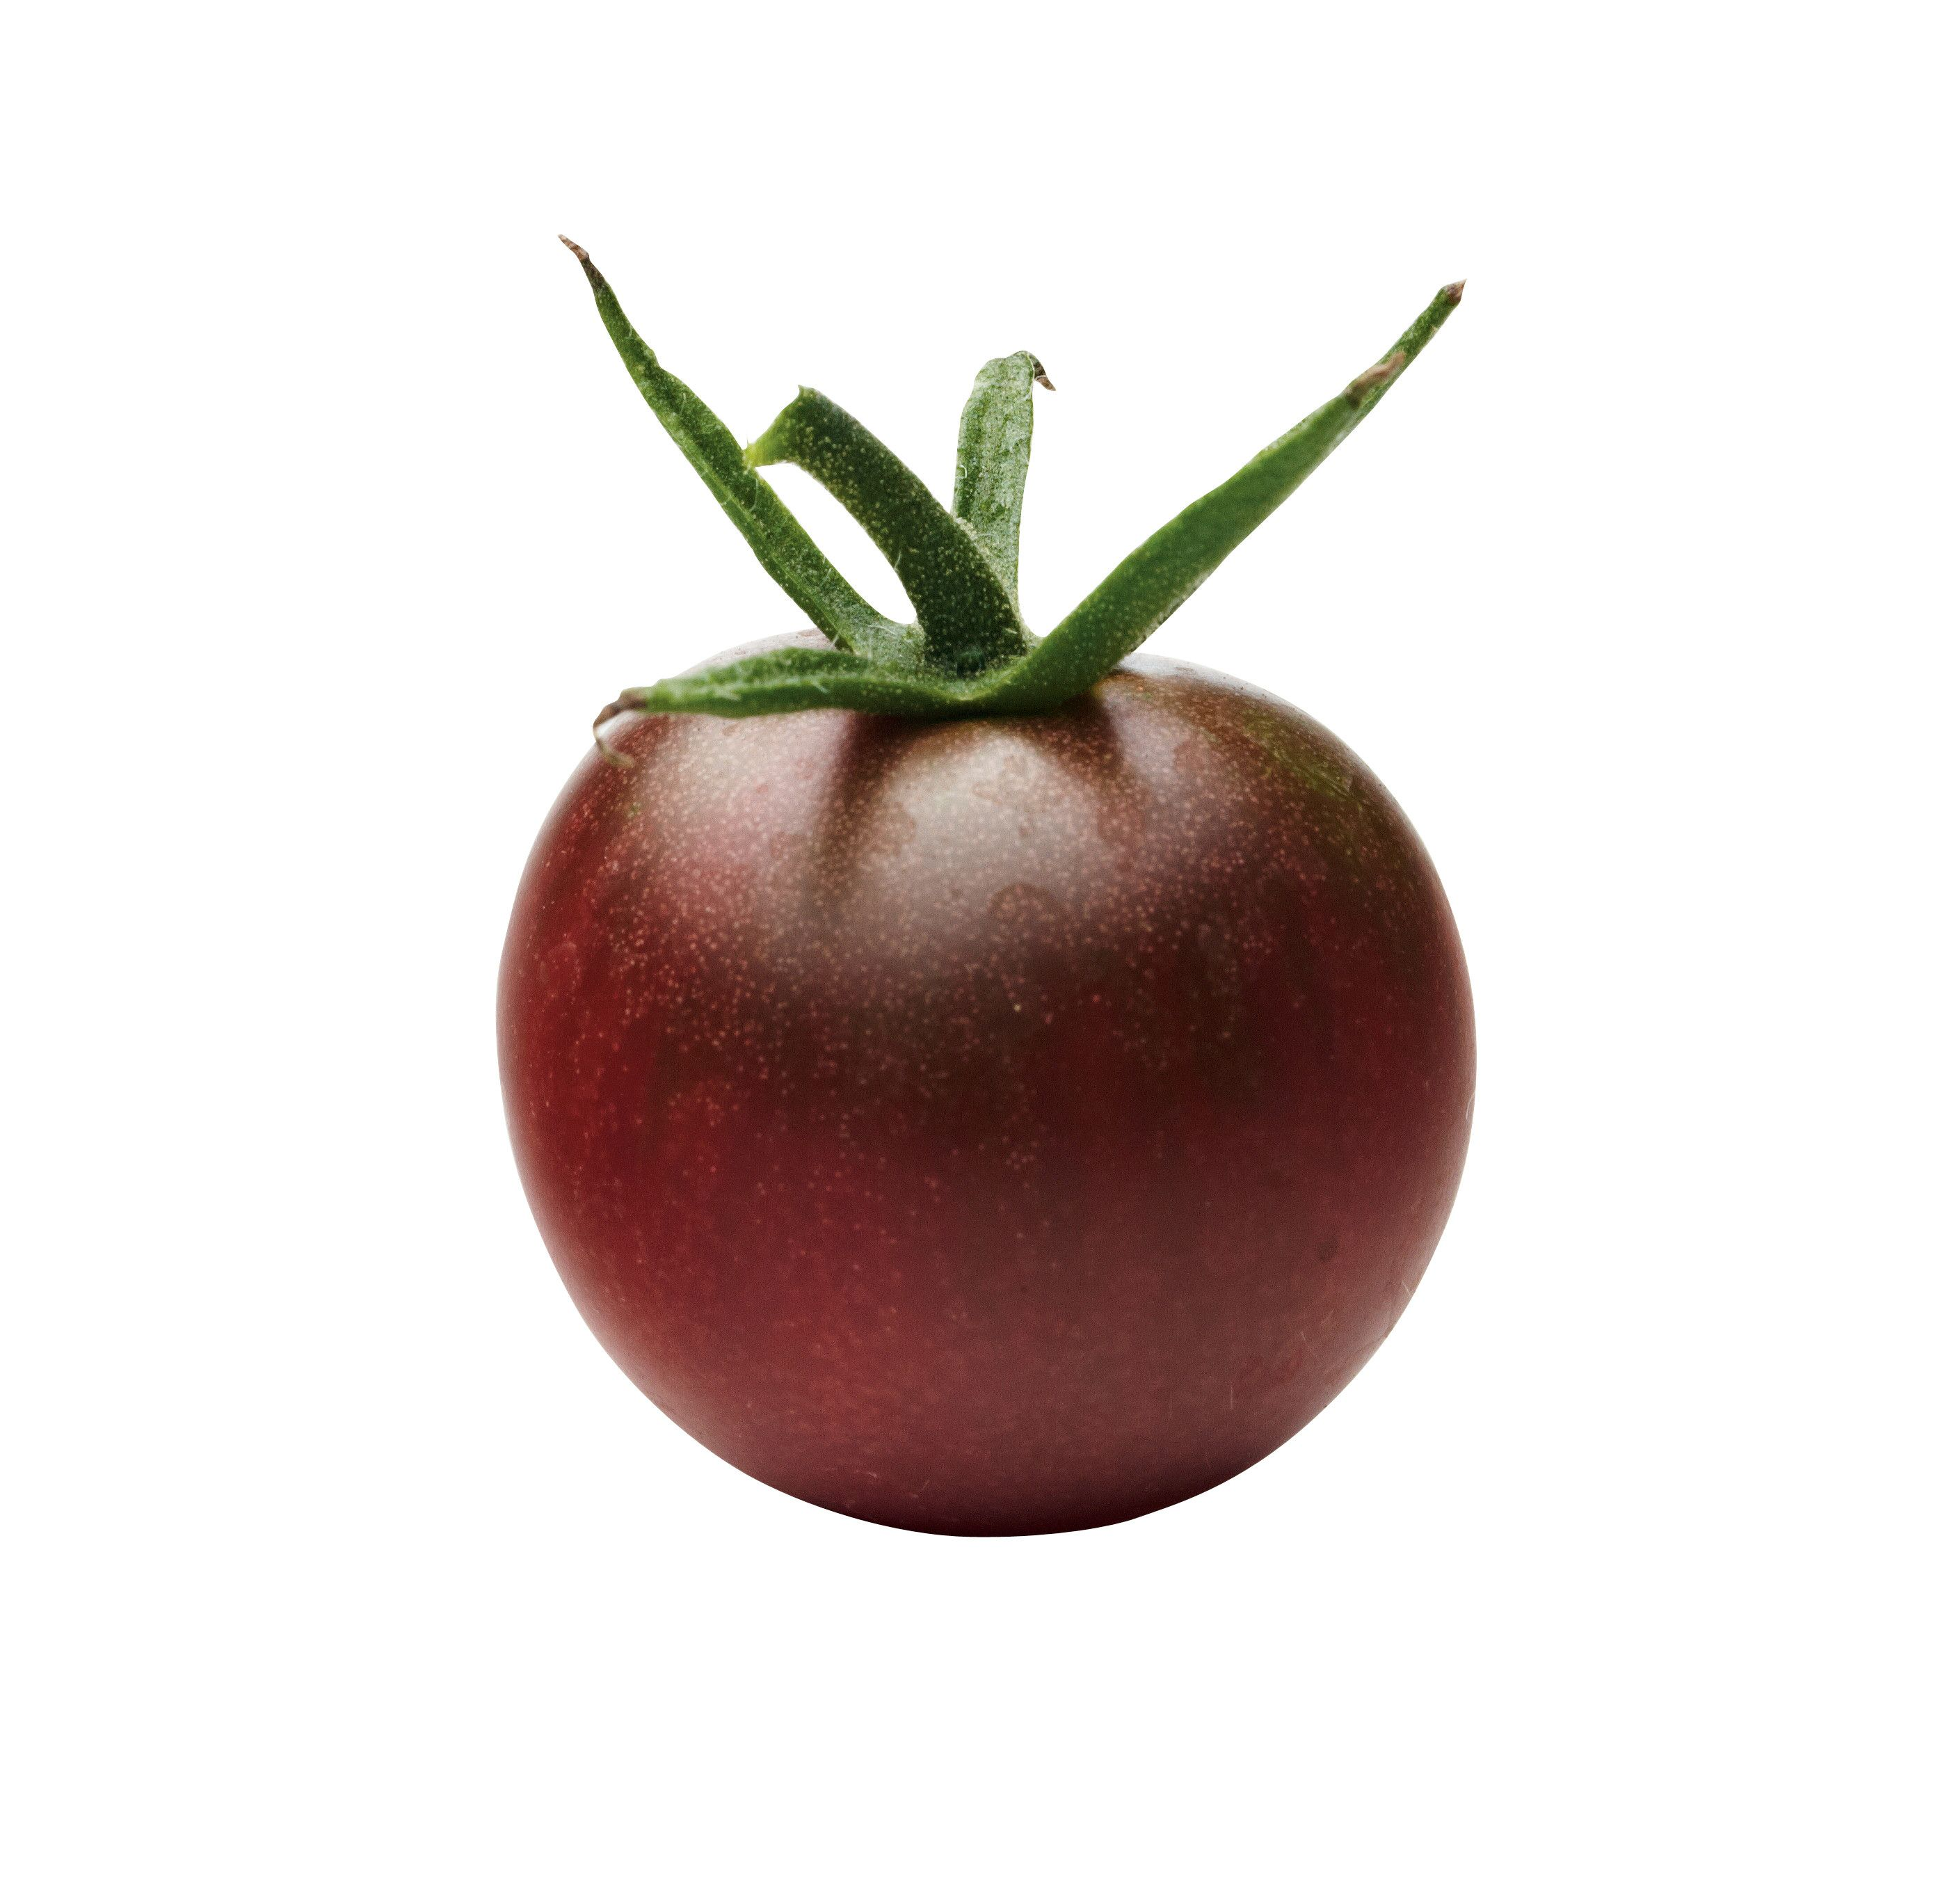 Homegrown Tomato Varieties